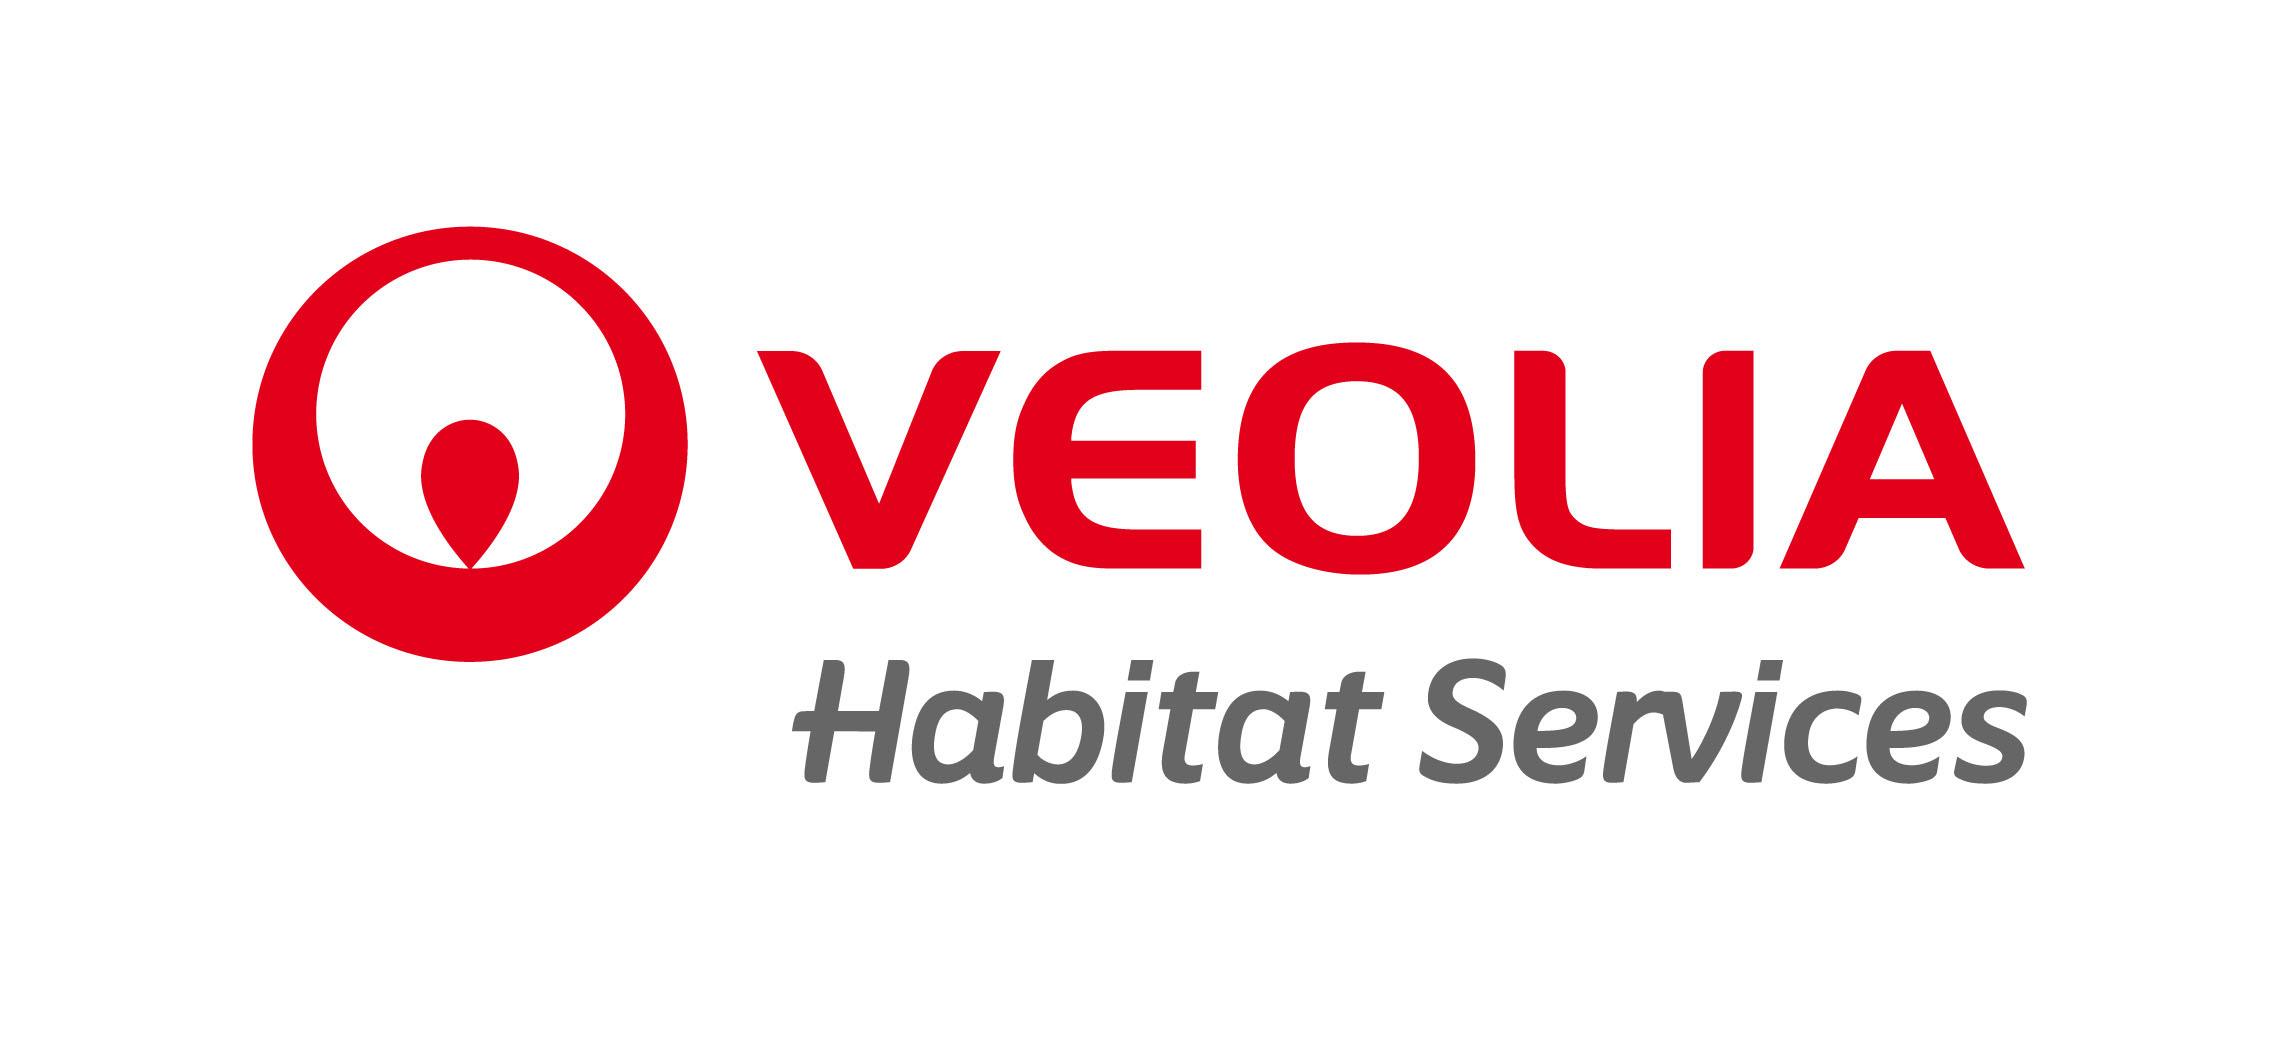 Veolia habitat services lance un grand sondage aupr s des internautes femin - Veolia habitat services ...